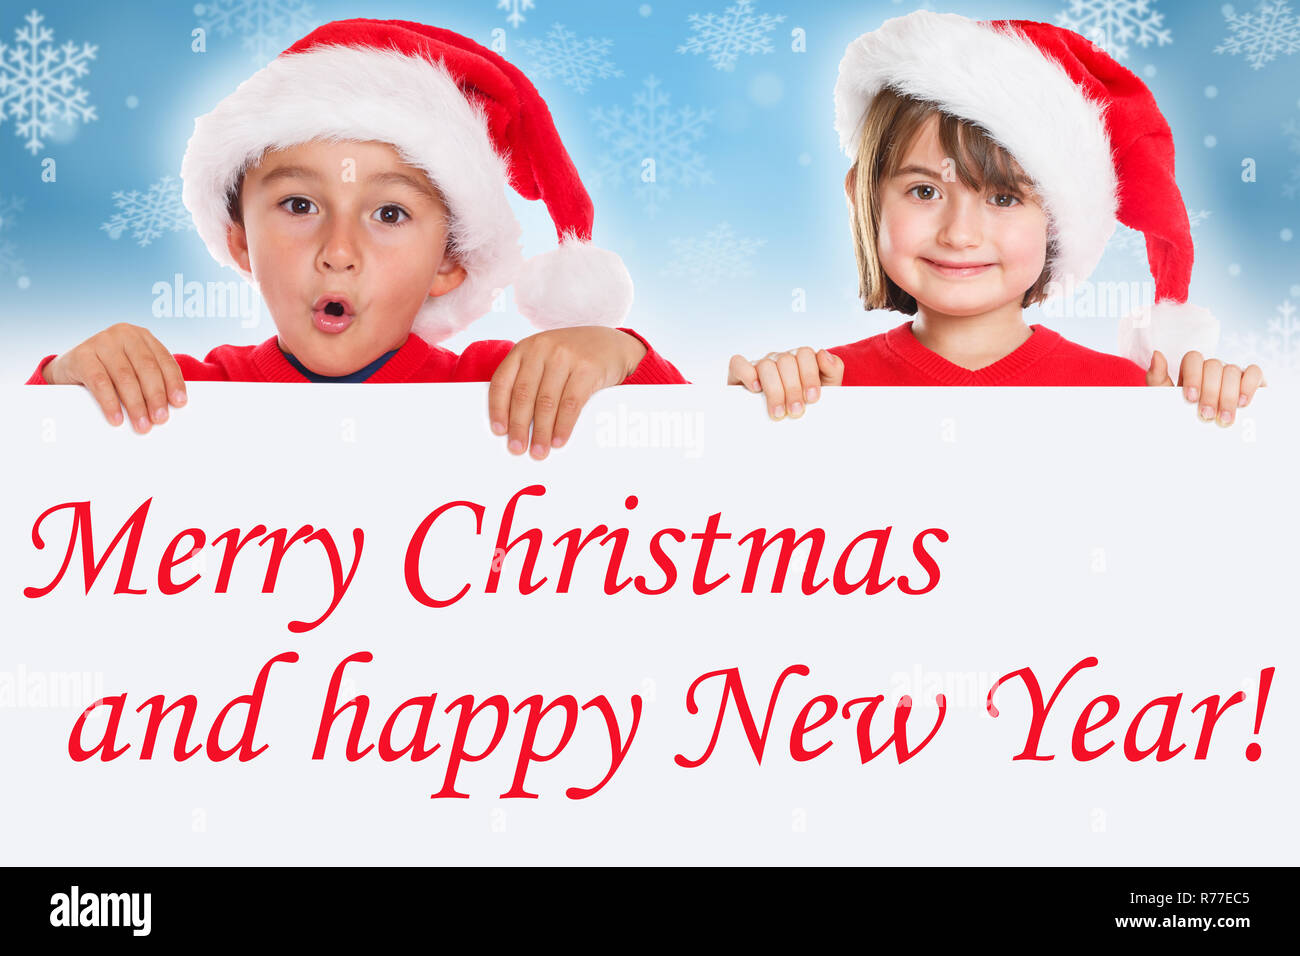 Buon Natale Bambini.Buon Natale Bambini Kids Card Babbo Natale Saluti Foto Immagine